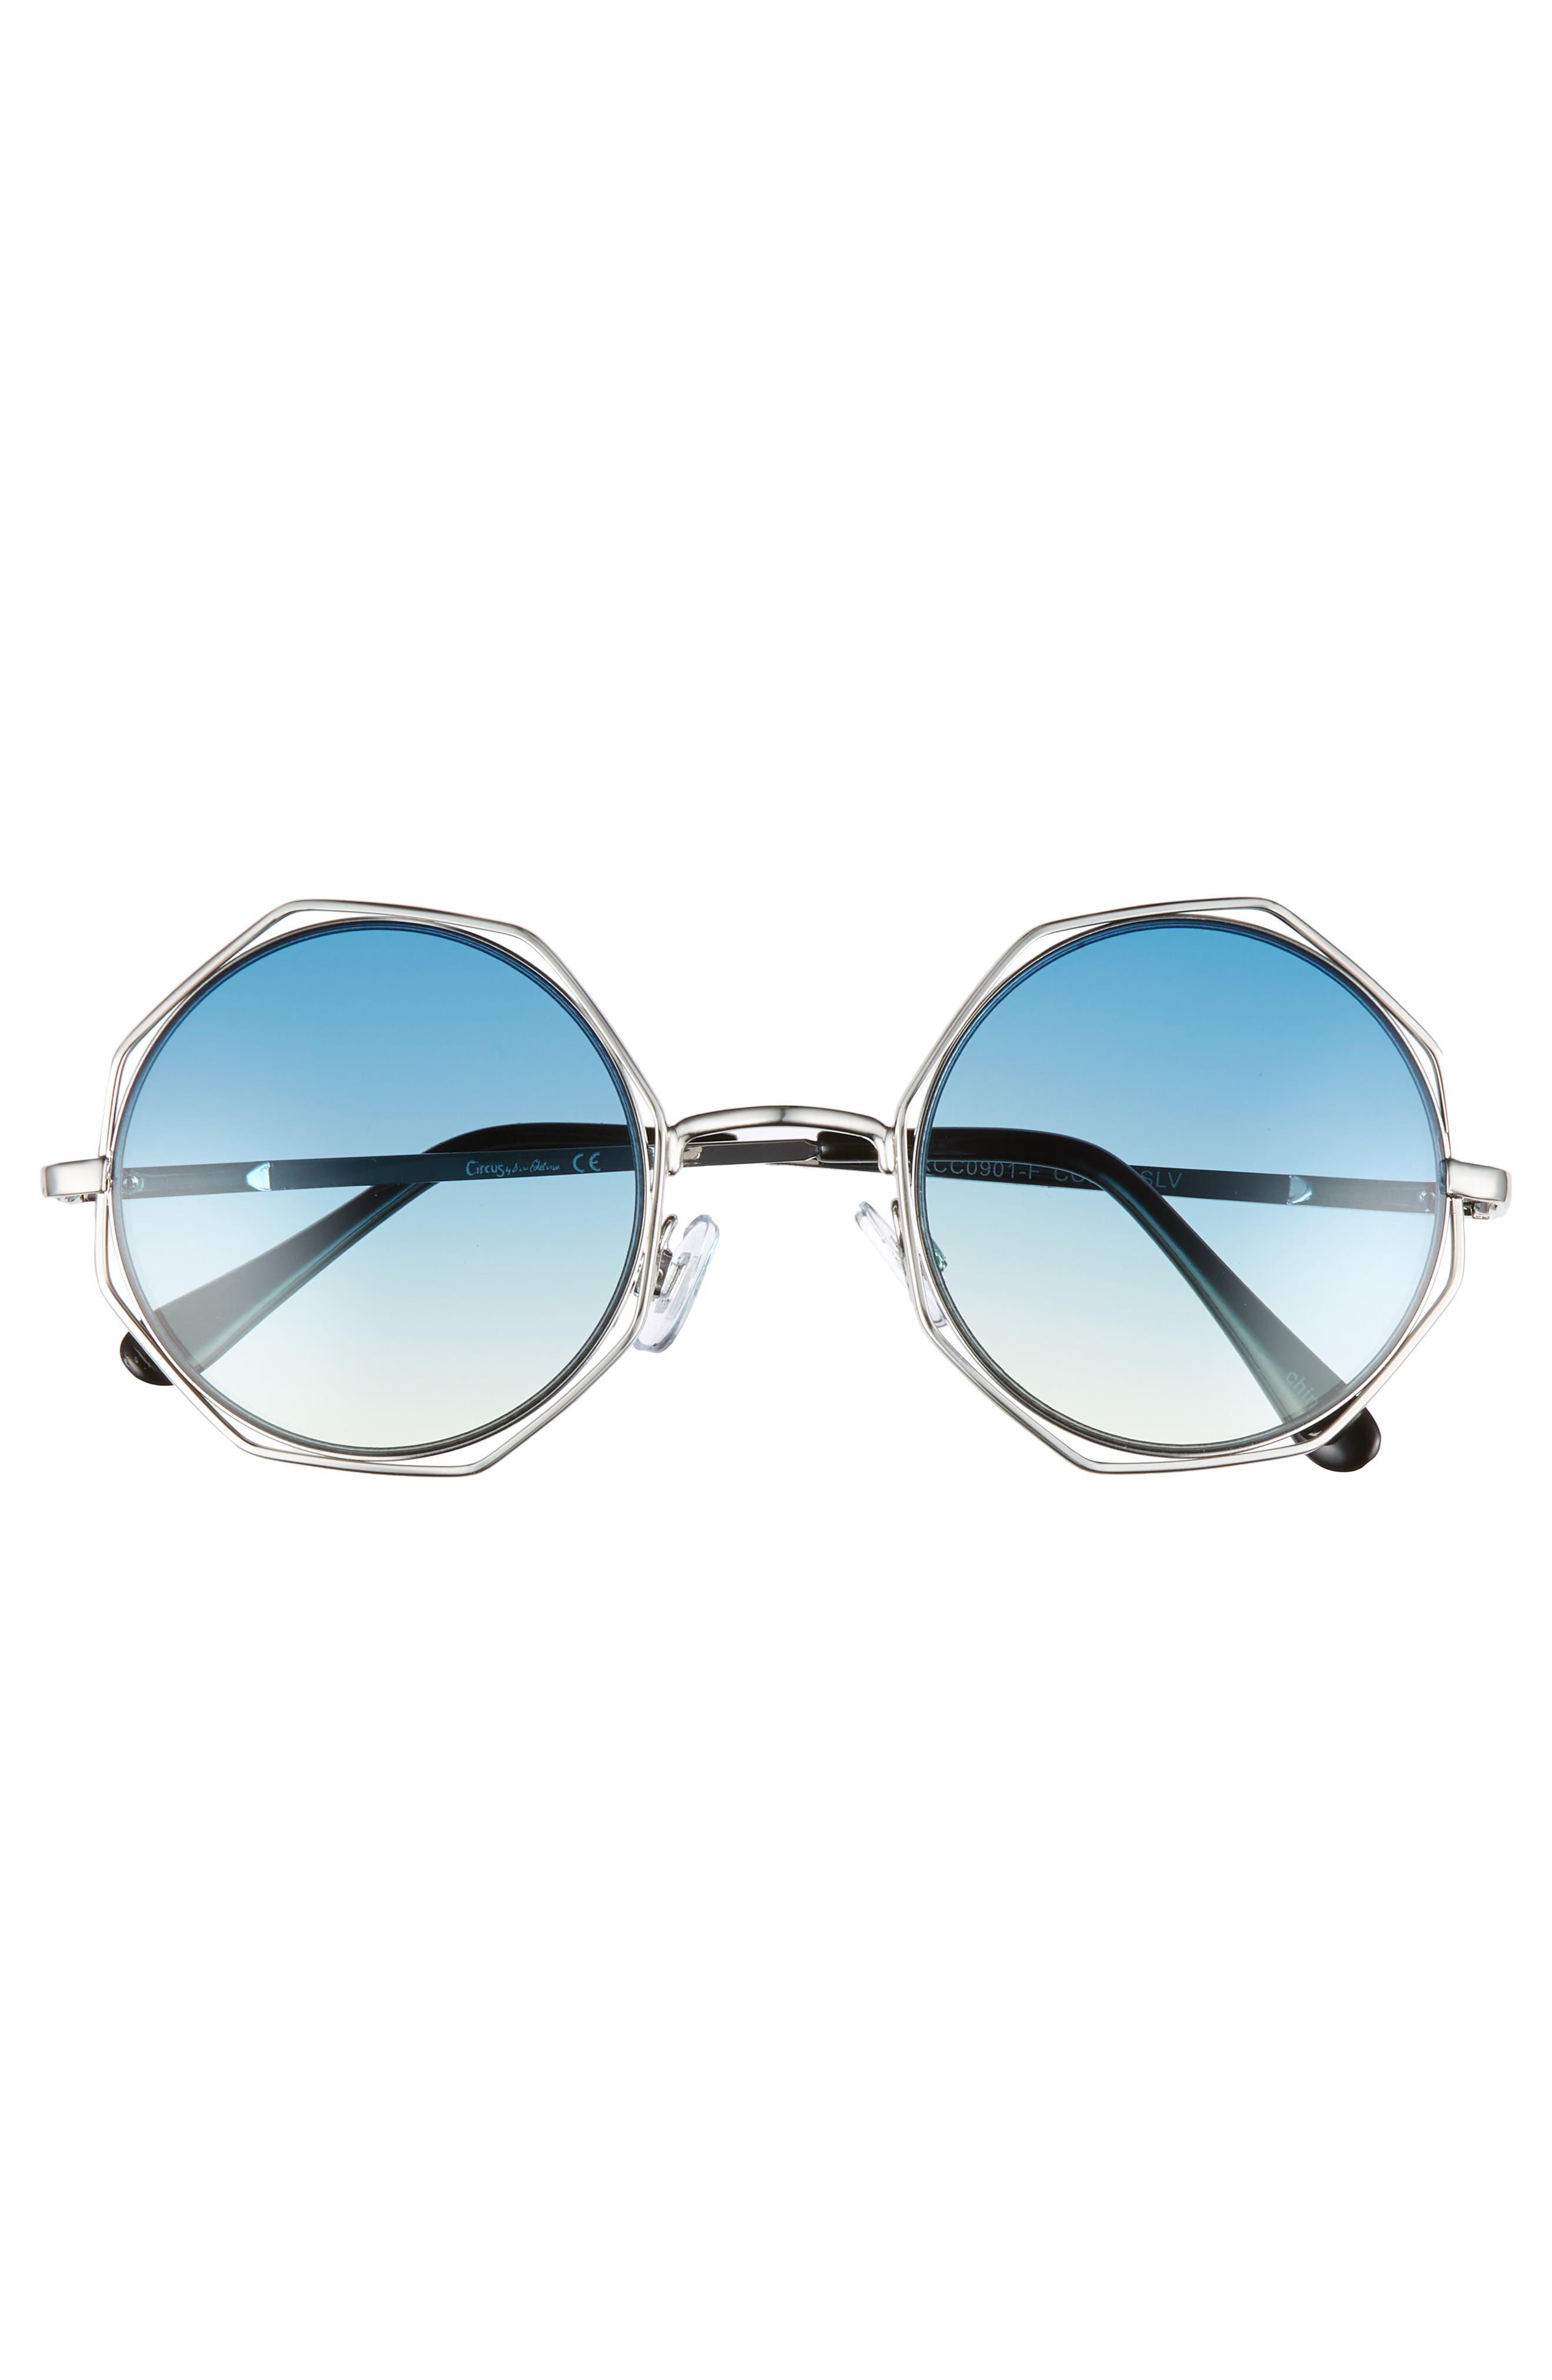 50mm Round Sunglasses,                             Alternate thumbnail 3, color,                             040